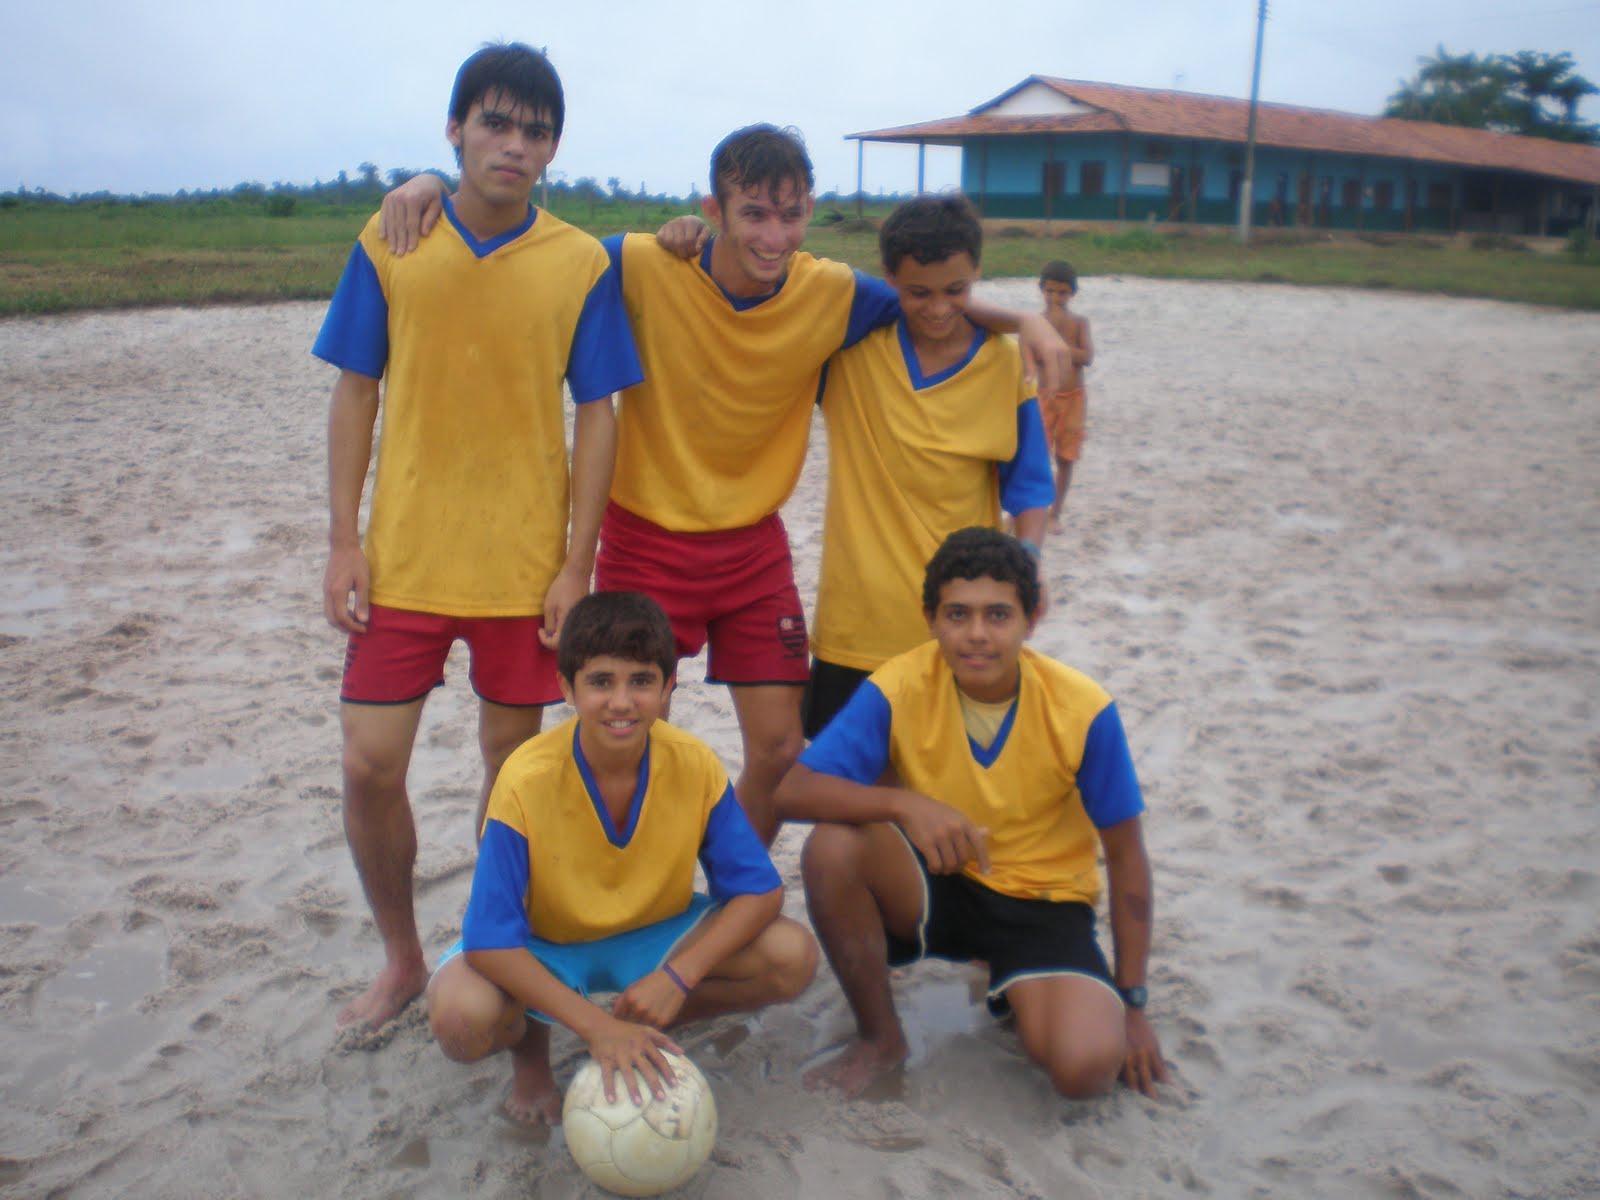 NNFL: Liga Norte-nordeste de Football. LIGA  NN DE FUT.  AMERICANO.